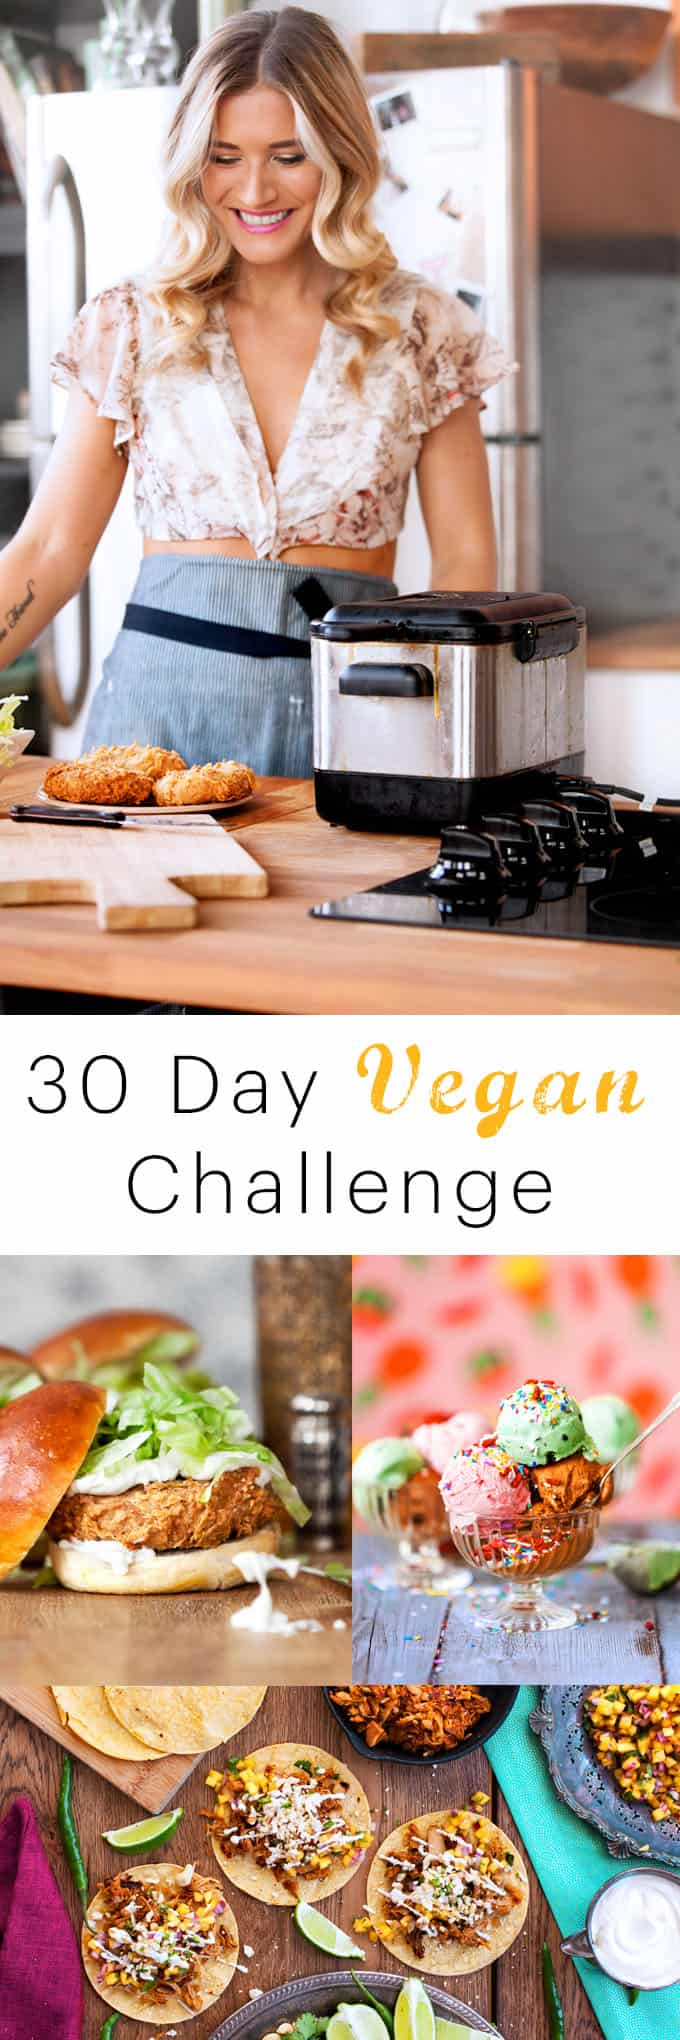 30 days vegan challenge